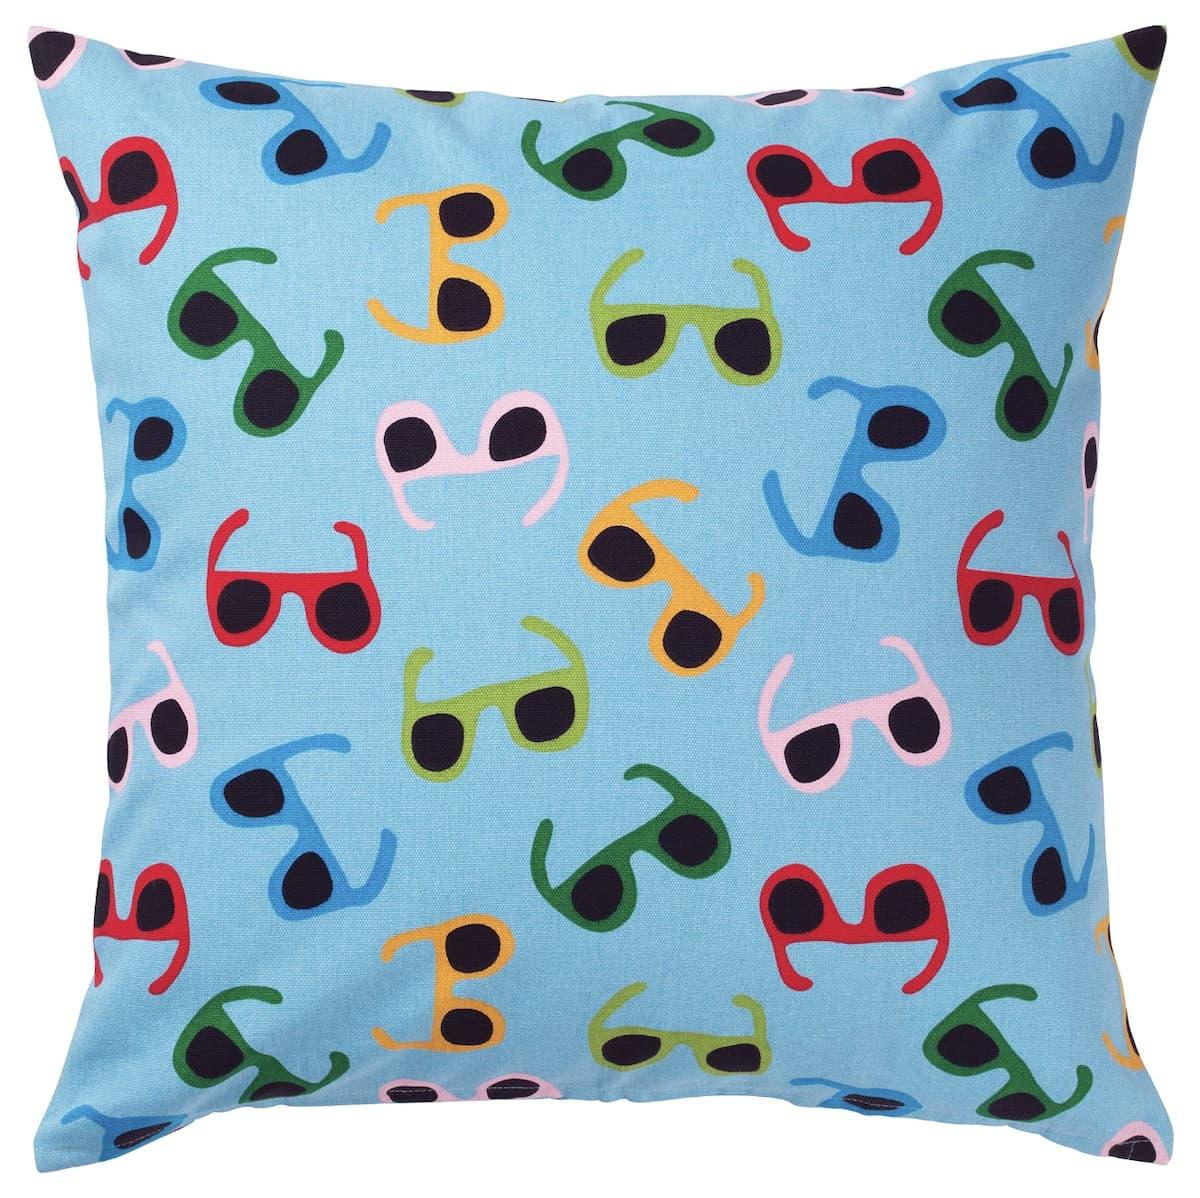 Latest IKEA product SOMMAR Light Blue Cushion Cover